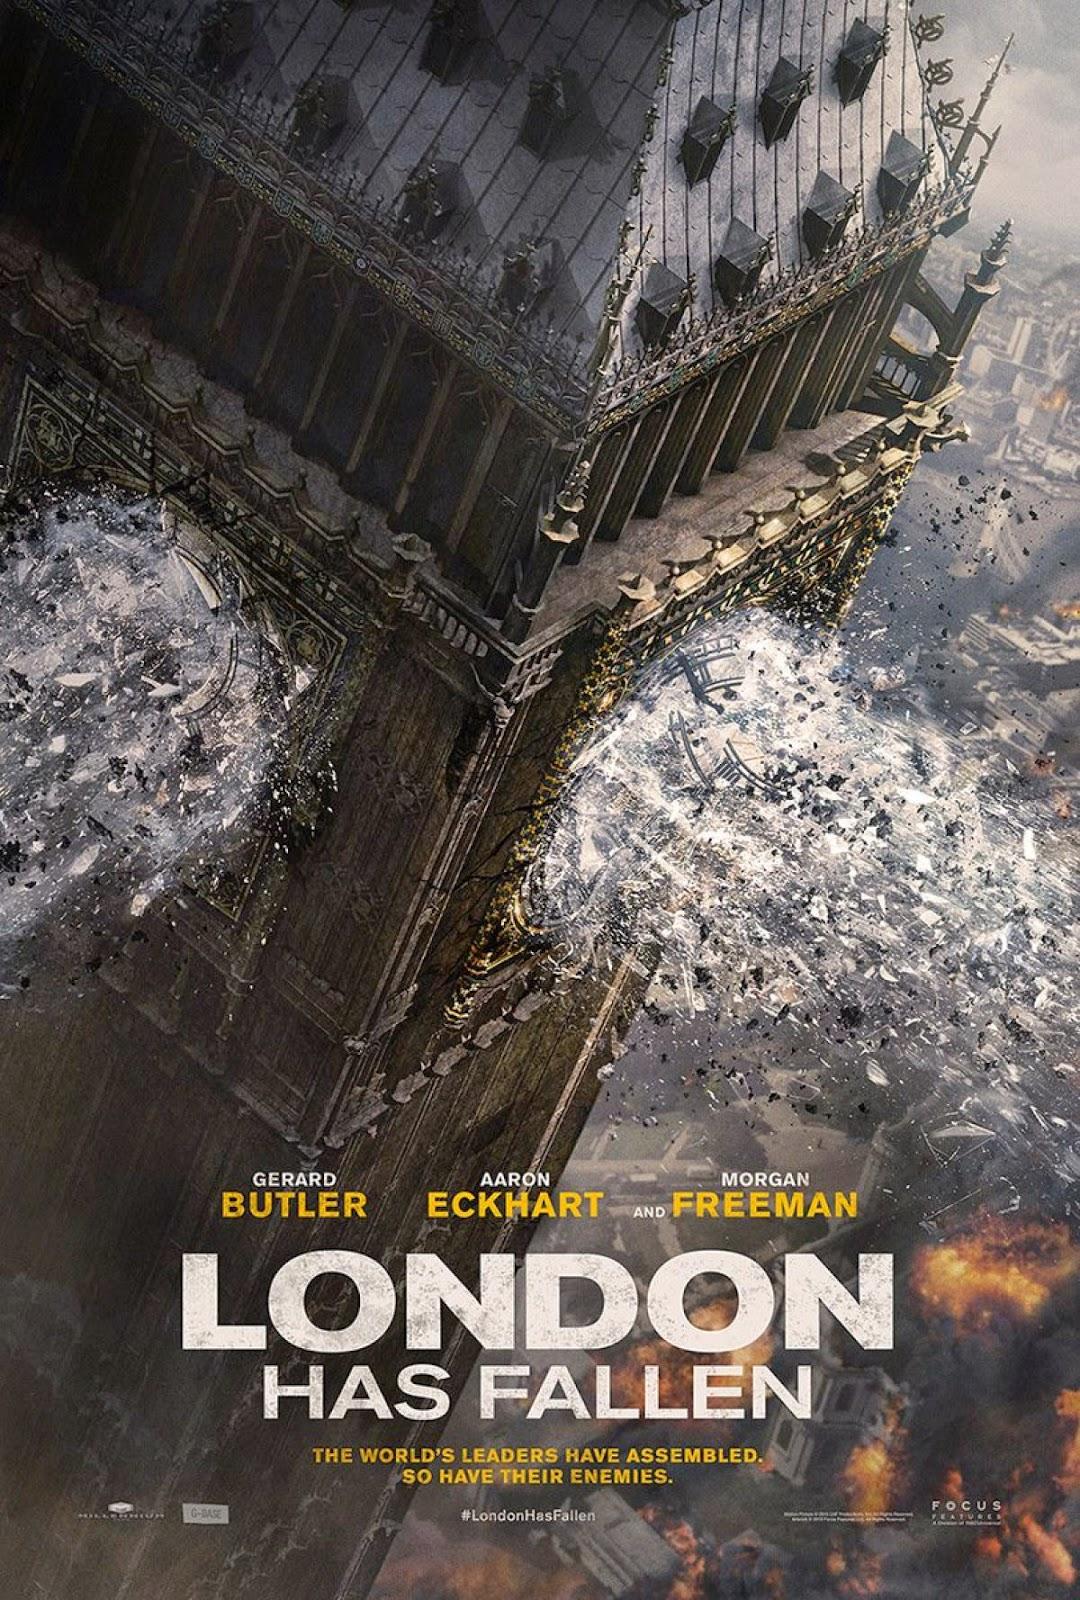 London Has Fallen  ฝ่าวิกฤติ วินาศกรรมทำเนียบขาว 2 [HD]